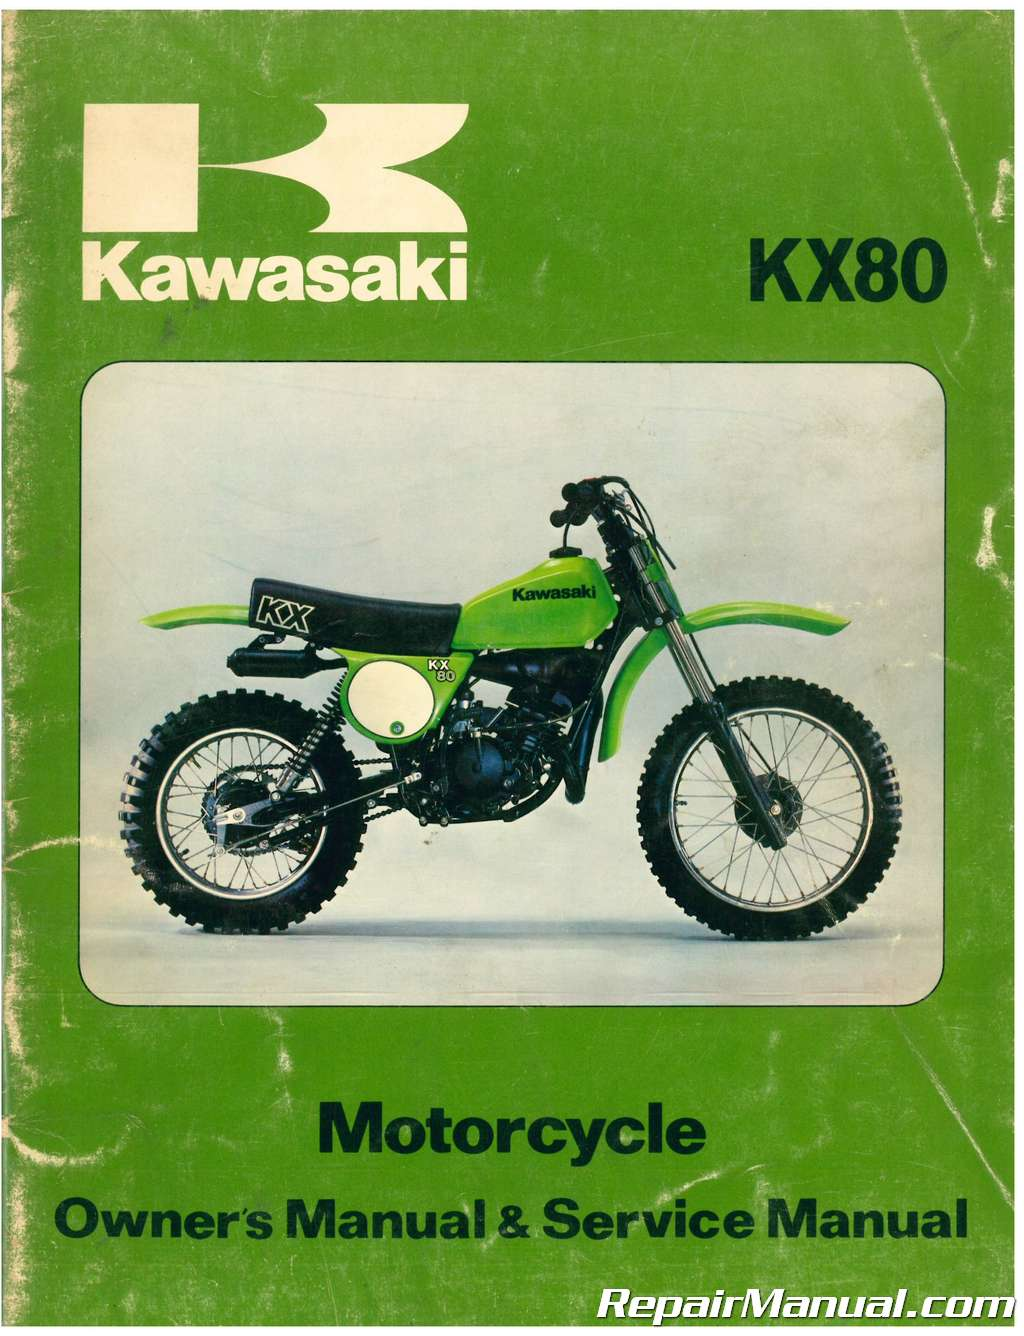 ... Array - used 1979 kawasaki kx80 a1 motorcycle owners service manual rh  repairmanual ...